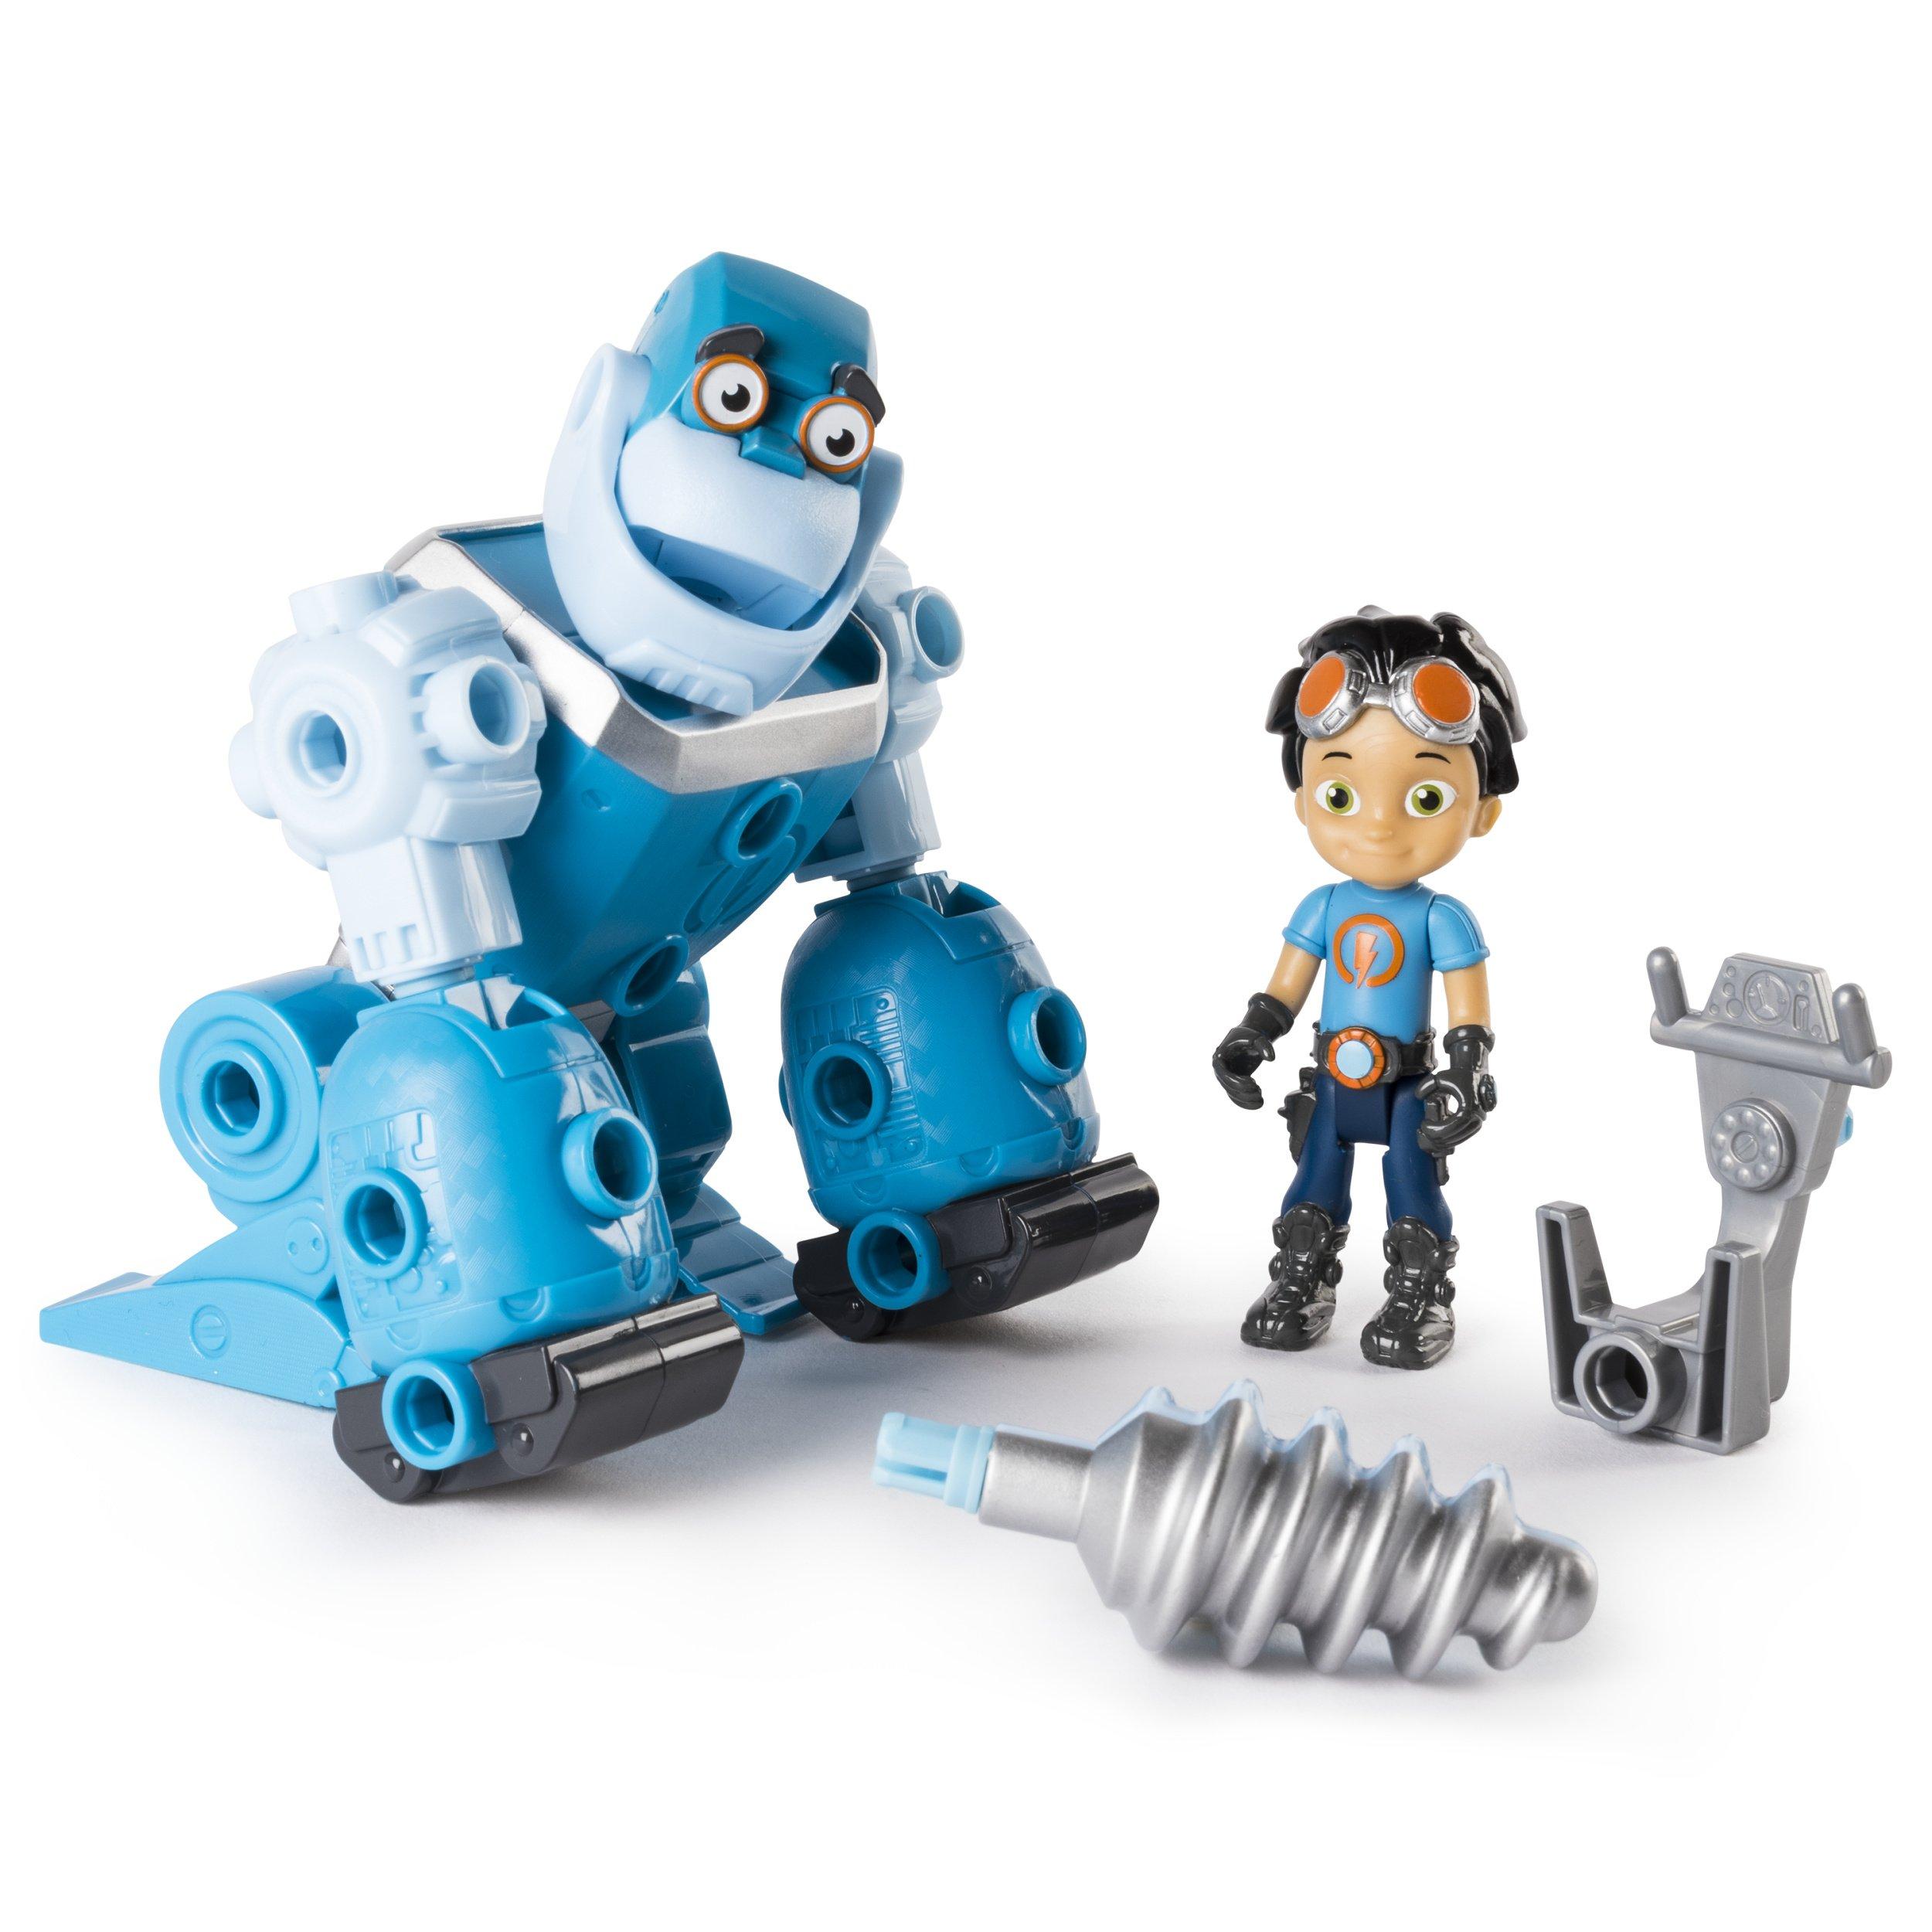 1//64 ertl custom farm toy Pallet ariens mower snowblower skid parts dcp s scale